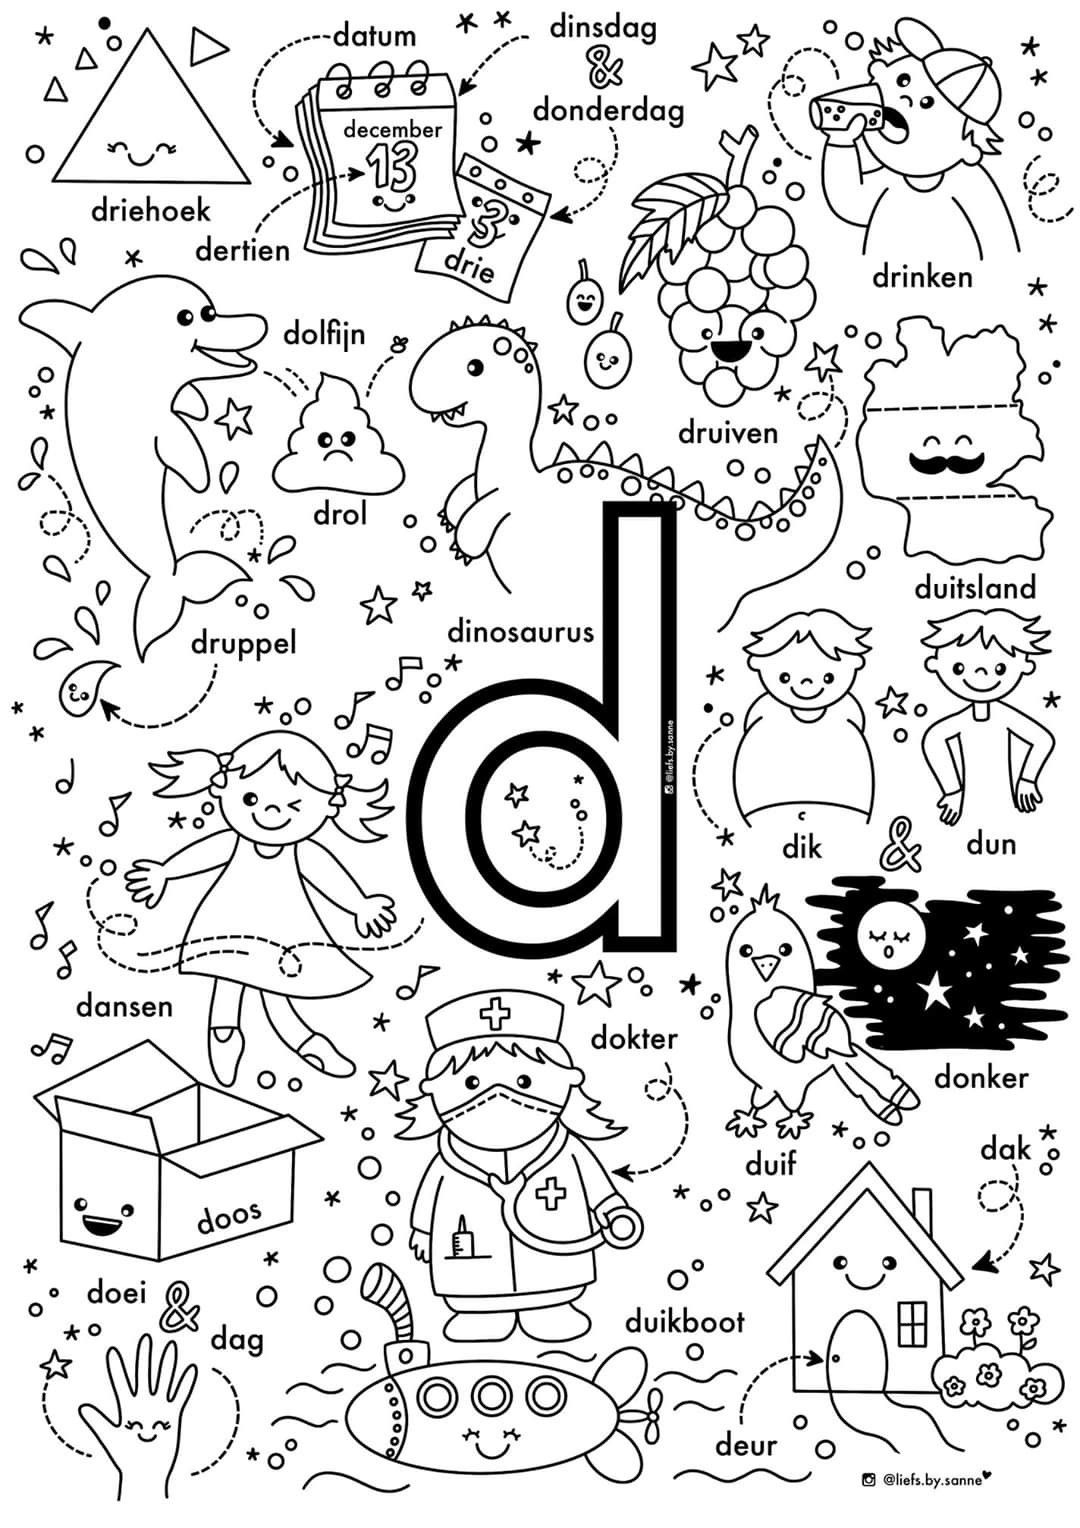 D Woorden Kleurplaat Letterherkenning Spelletjes Alfabet Boek Letterherkenning